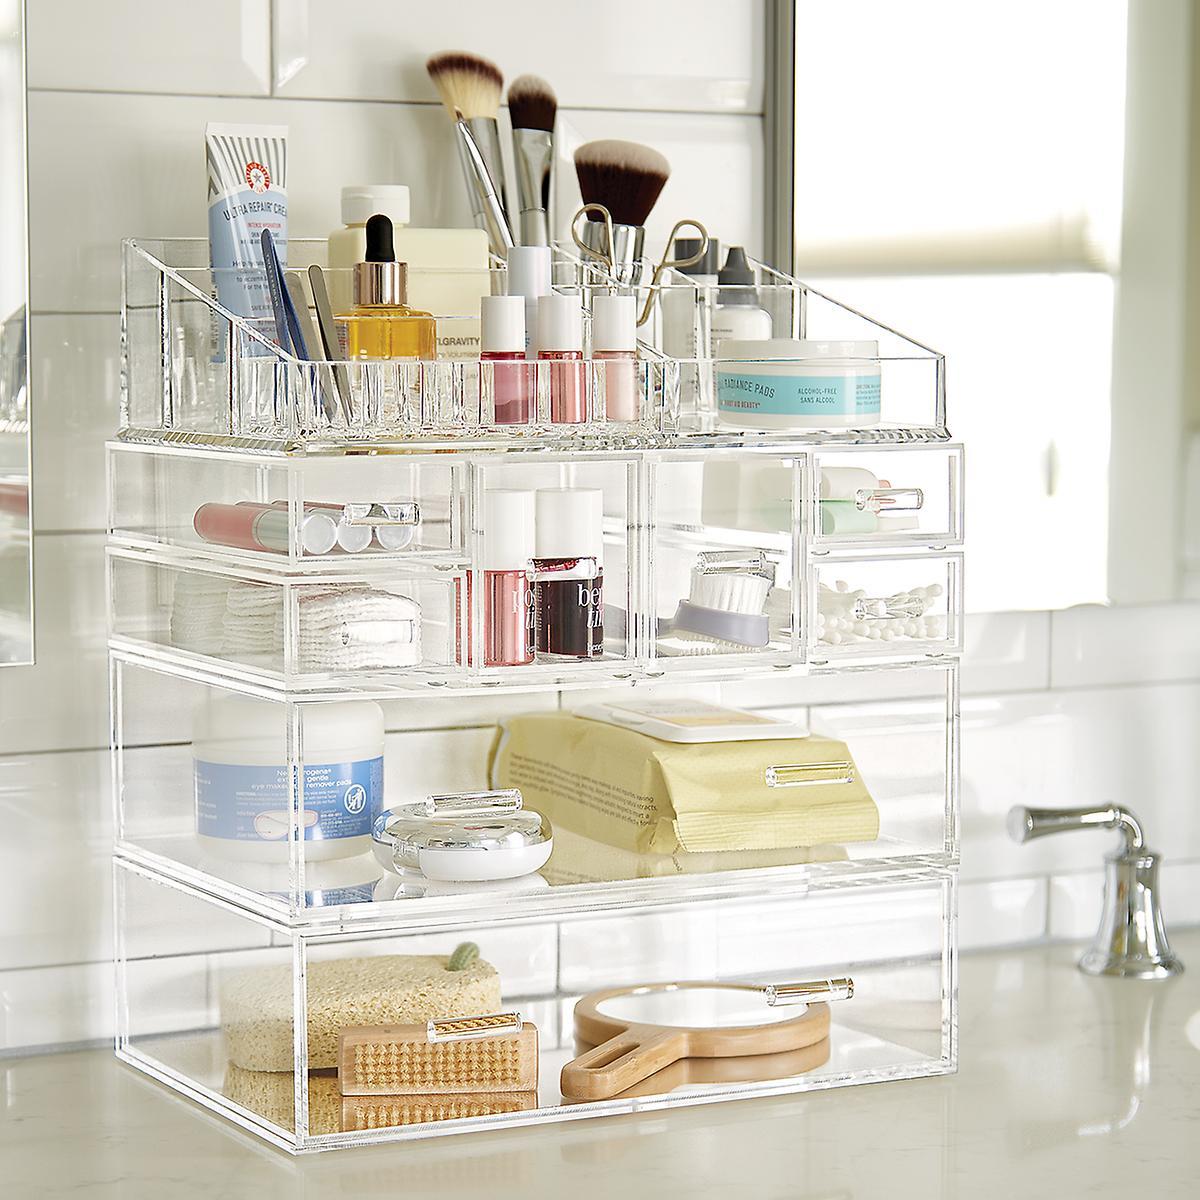 makes storage organization